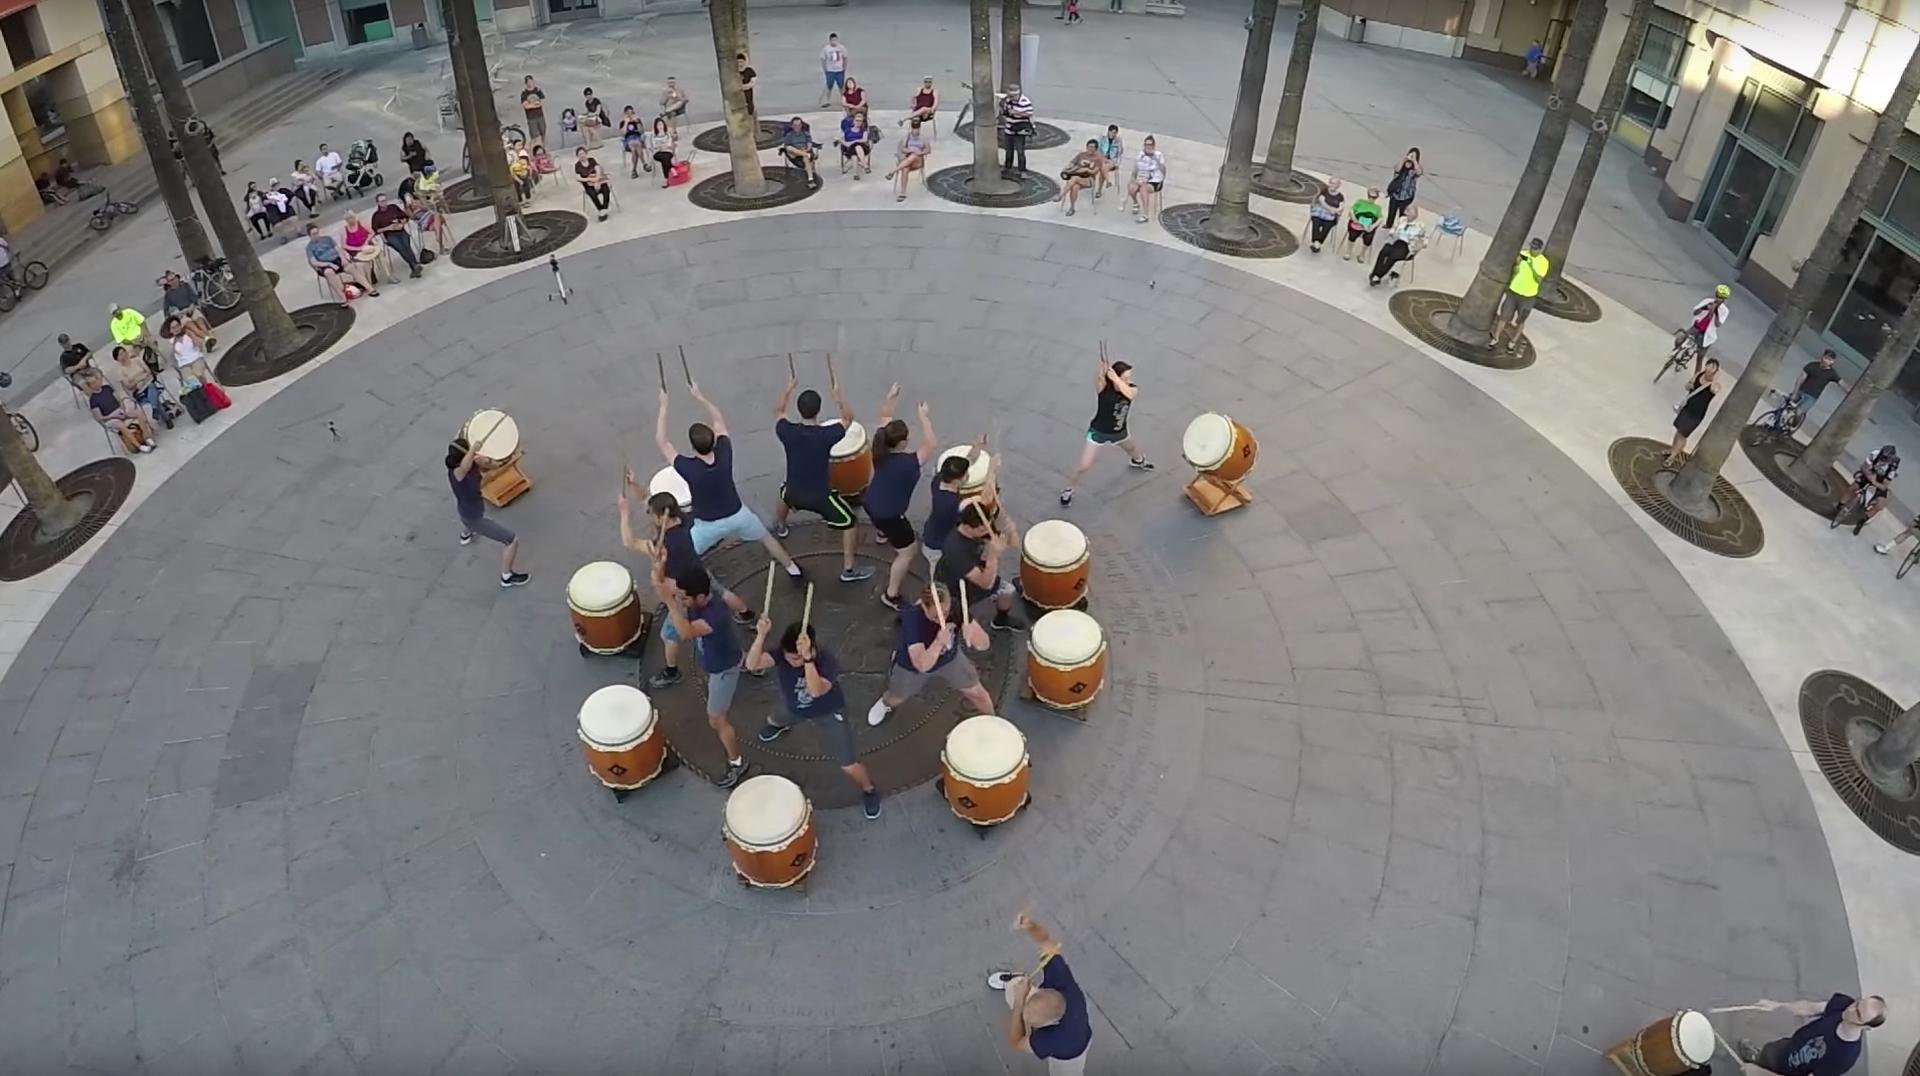 San Jose Taiko's experimental performances tap unique urban spaces